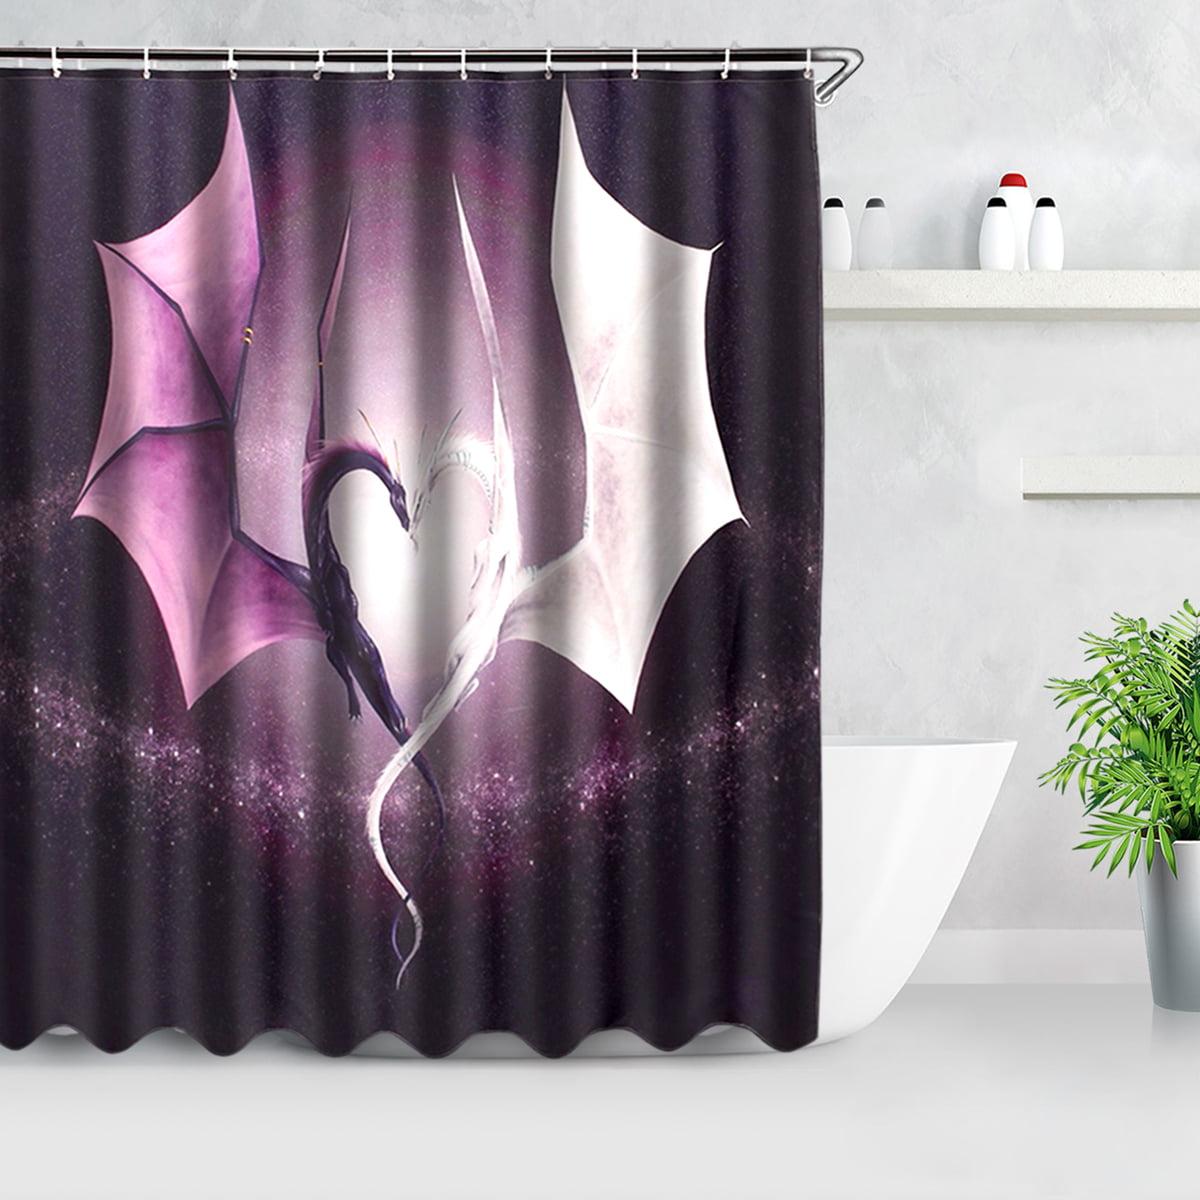 60 X 72 Inch Fashion Custom Print Dragon Waterproof Bathroom Fabric Polyester Fiber Washable Shower Curtain Valance With 12 Hooks Walmart Com Walmart Com